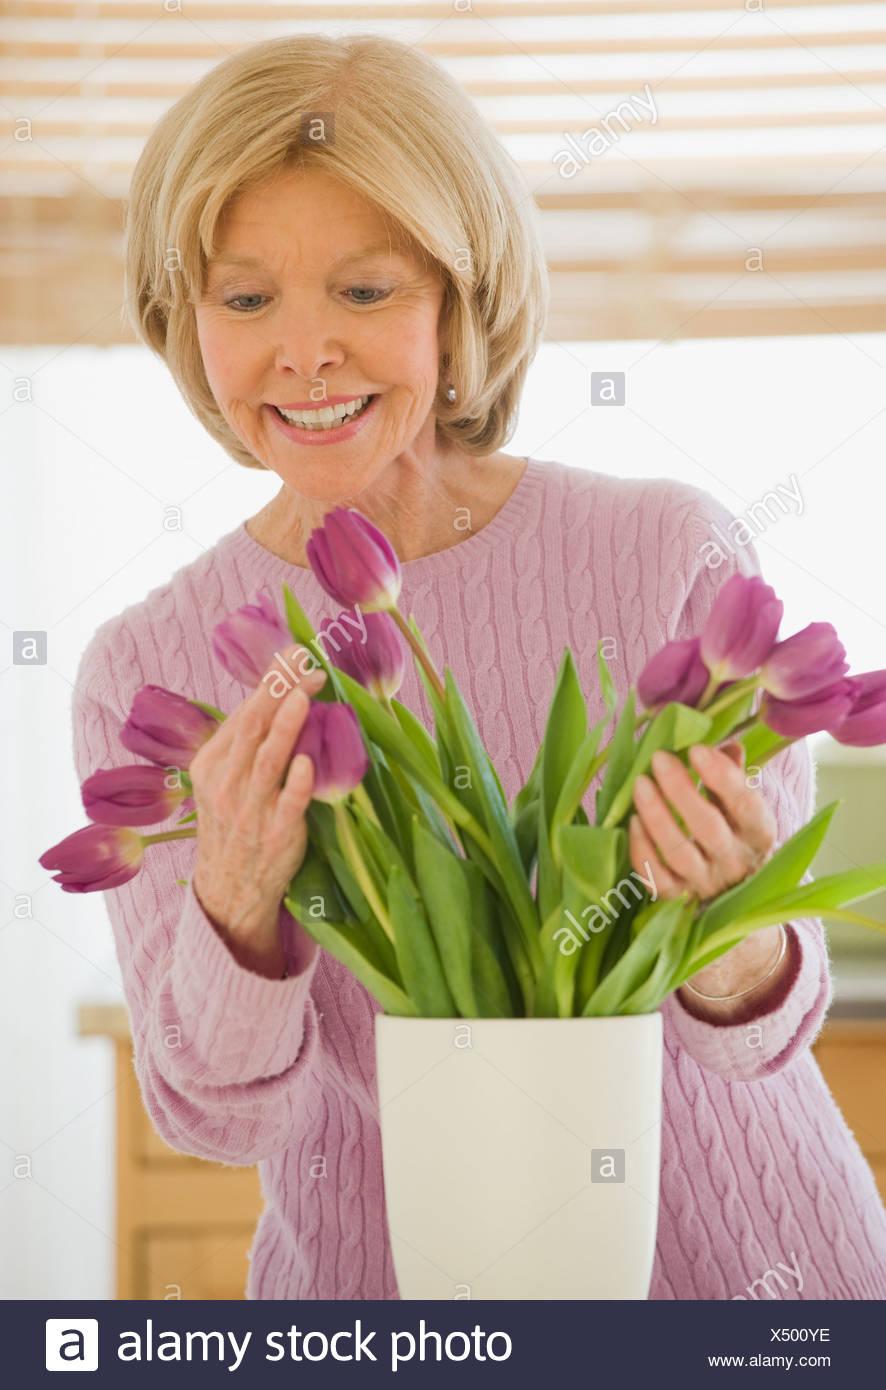 Senior woman arranging flowers Stock Photo